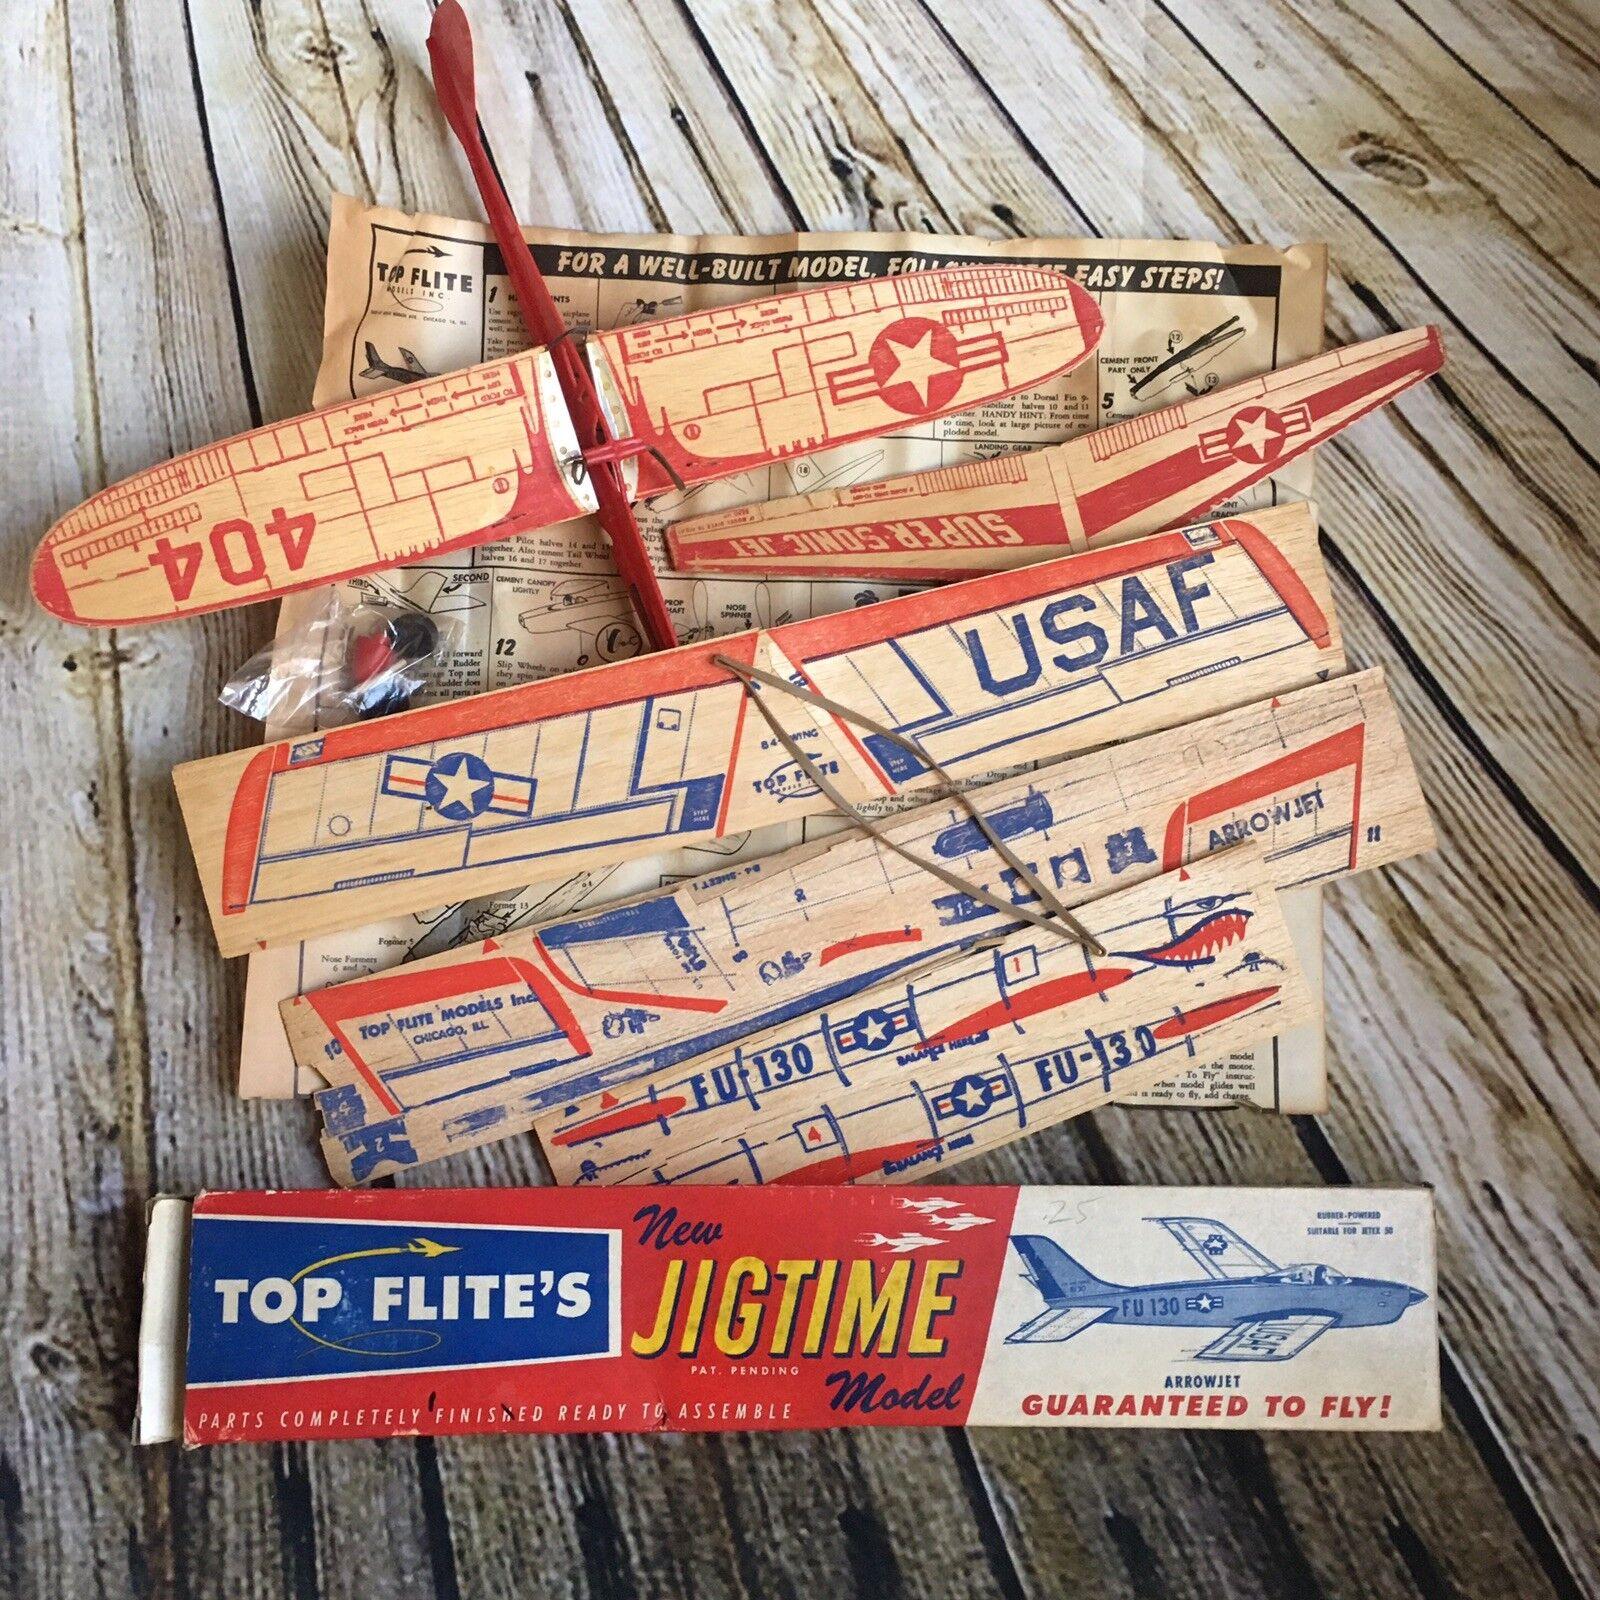 1950's TOP FLITE JIGTIME Super Sonic Arrowjet Balsa Wood Airplane Model Kit